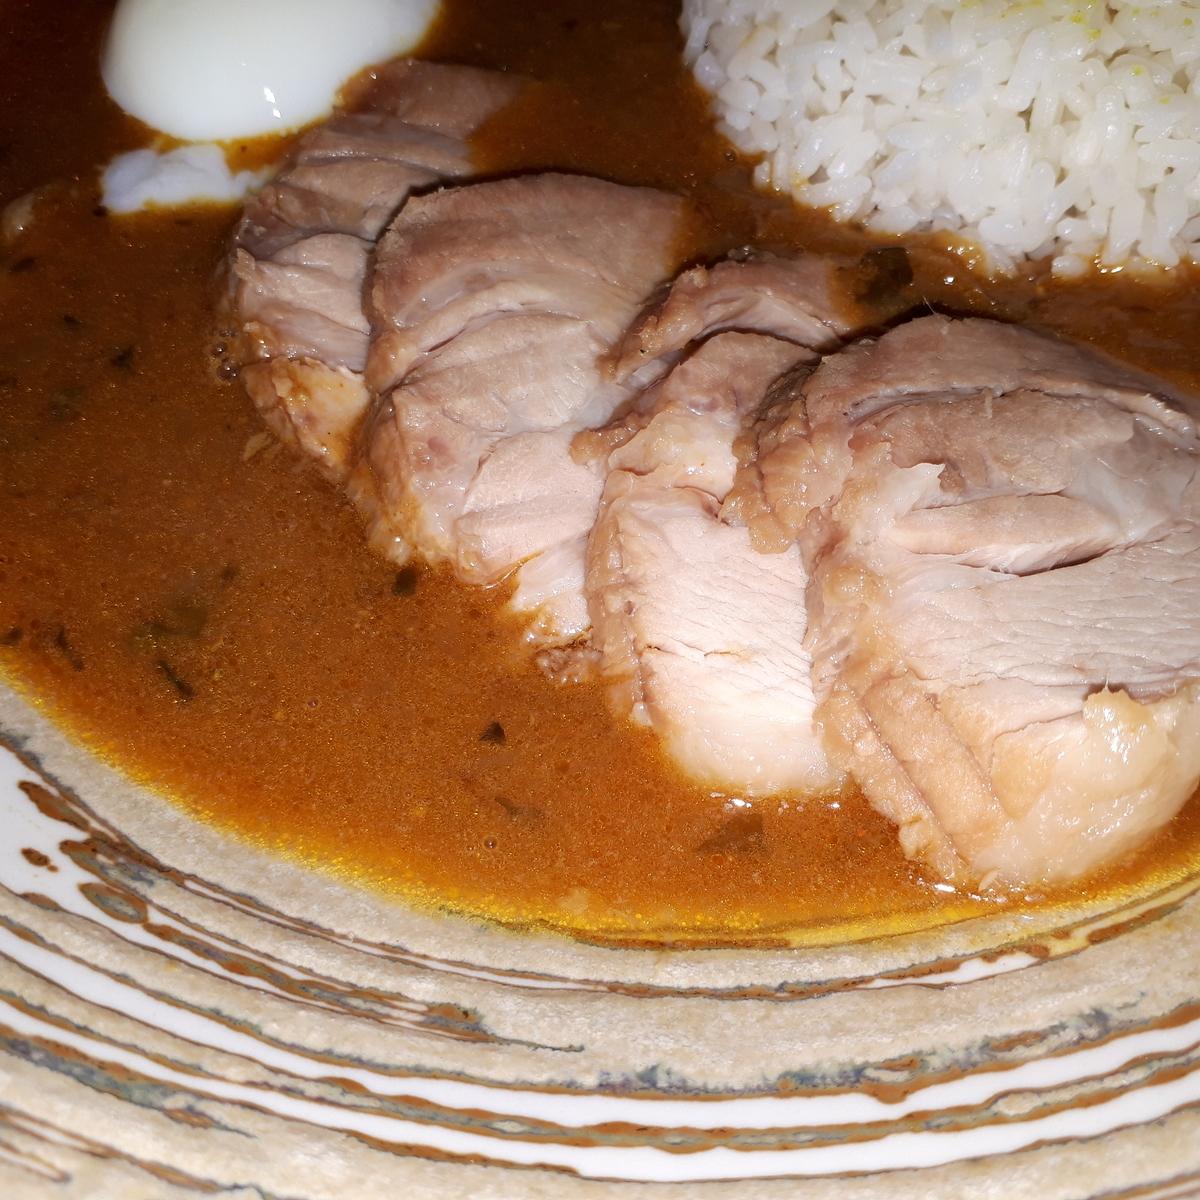 wacca 2019年3月22日 濃厚豚骨出汁の大阪スープカレー チャーシュー